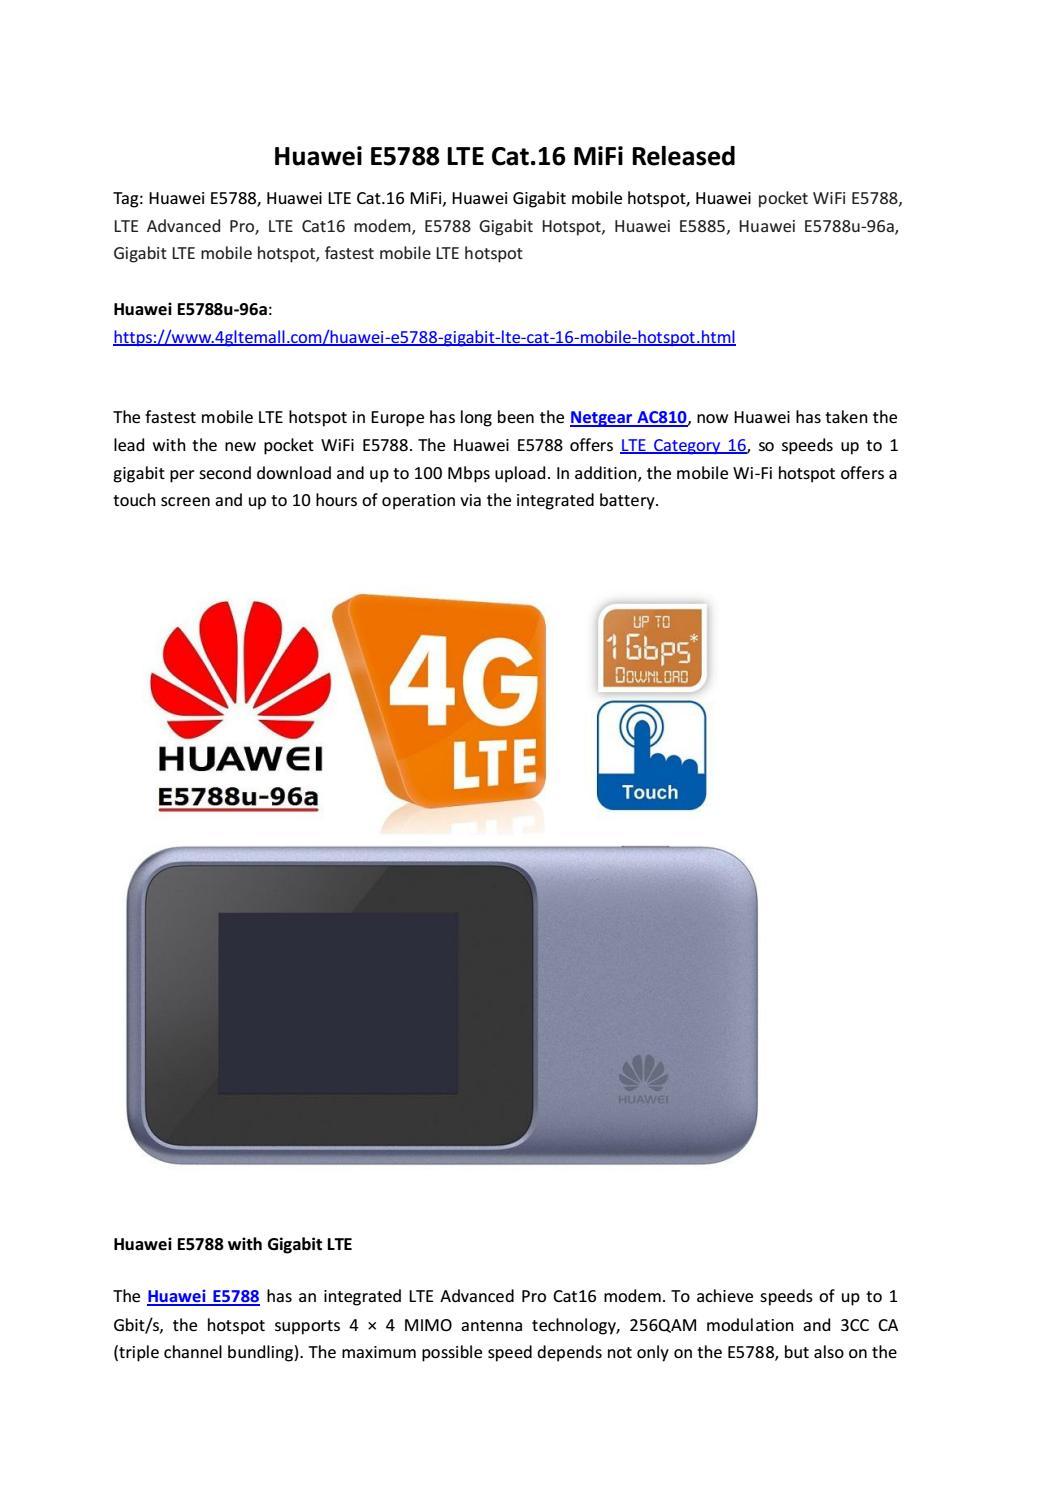 Pocket Wifi Europe